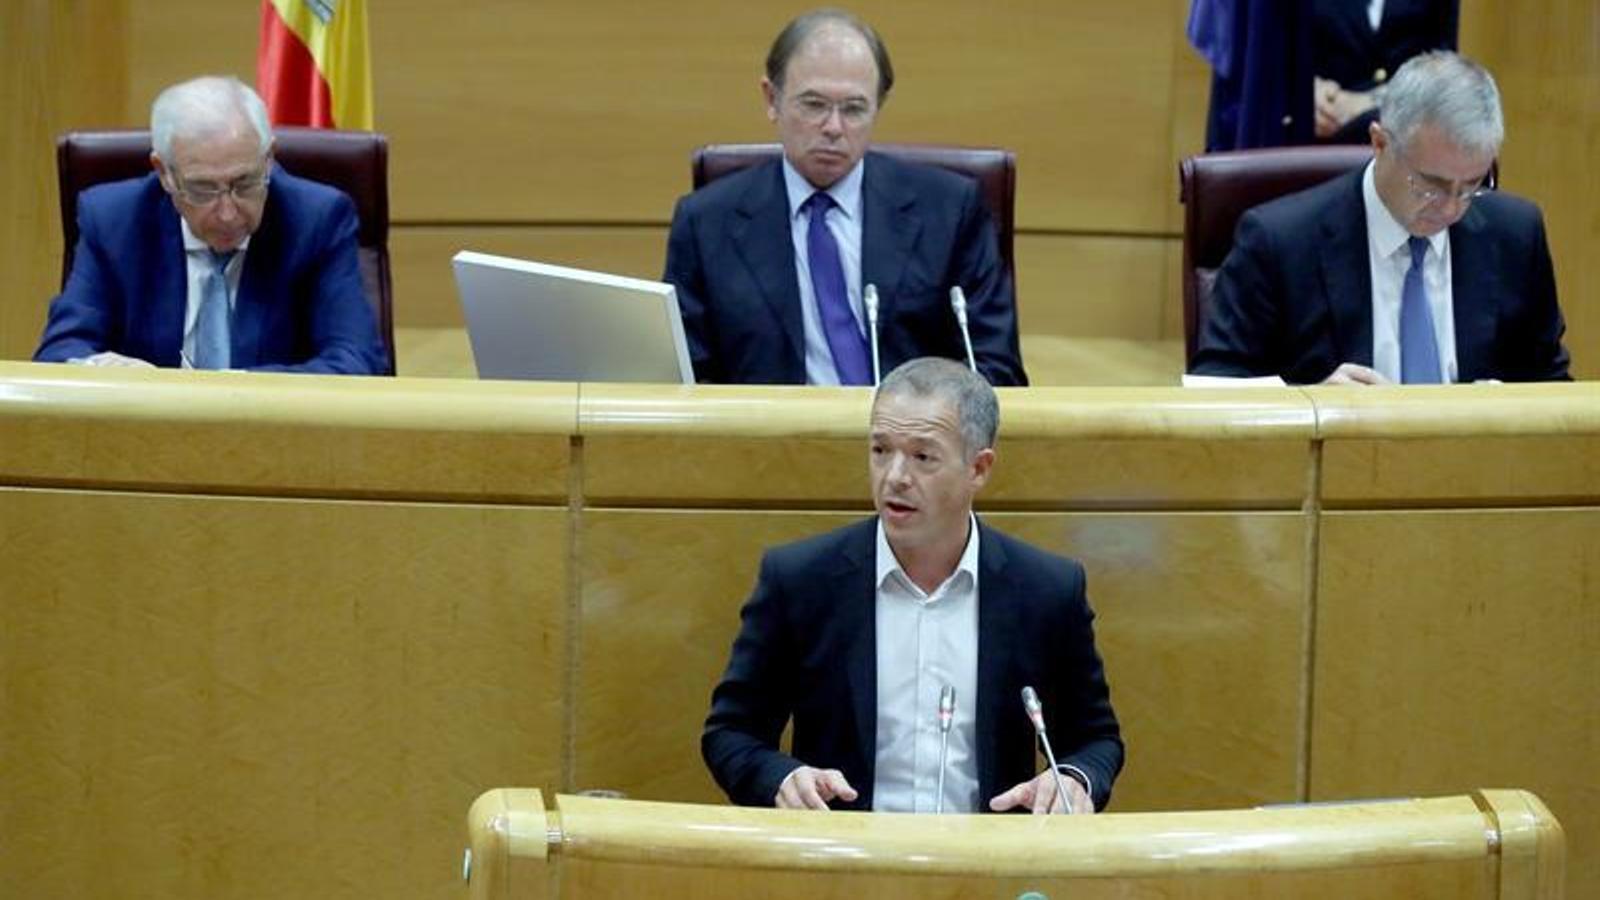 El PSOE retira l'esmena que suspenia el 155 si Puigdemont convocava eleccions